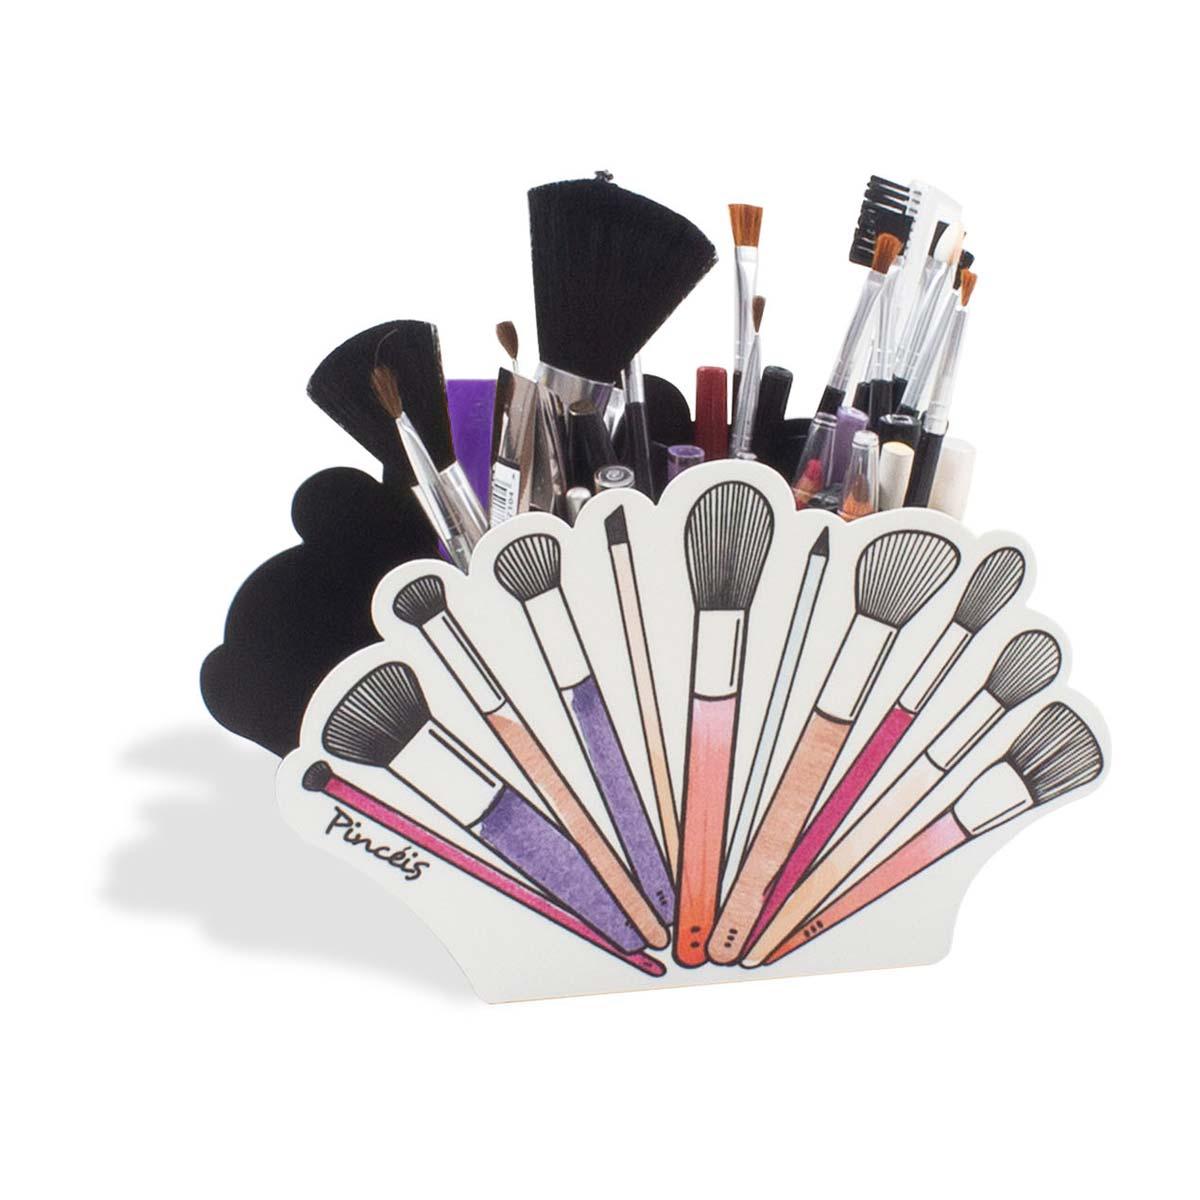 Organizador Porta Maquiagem e Pincéis Beauty